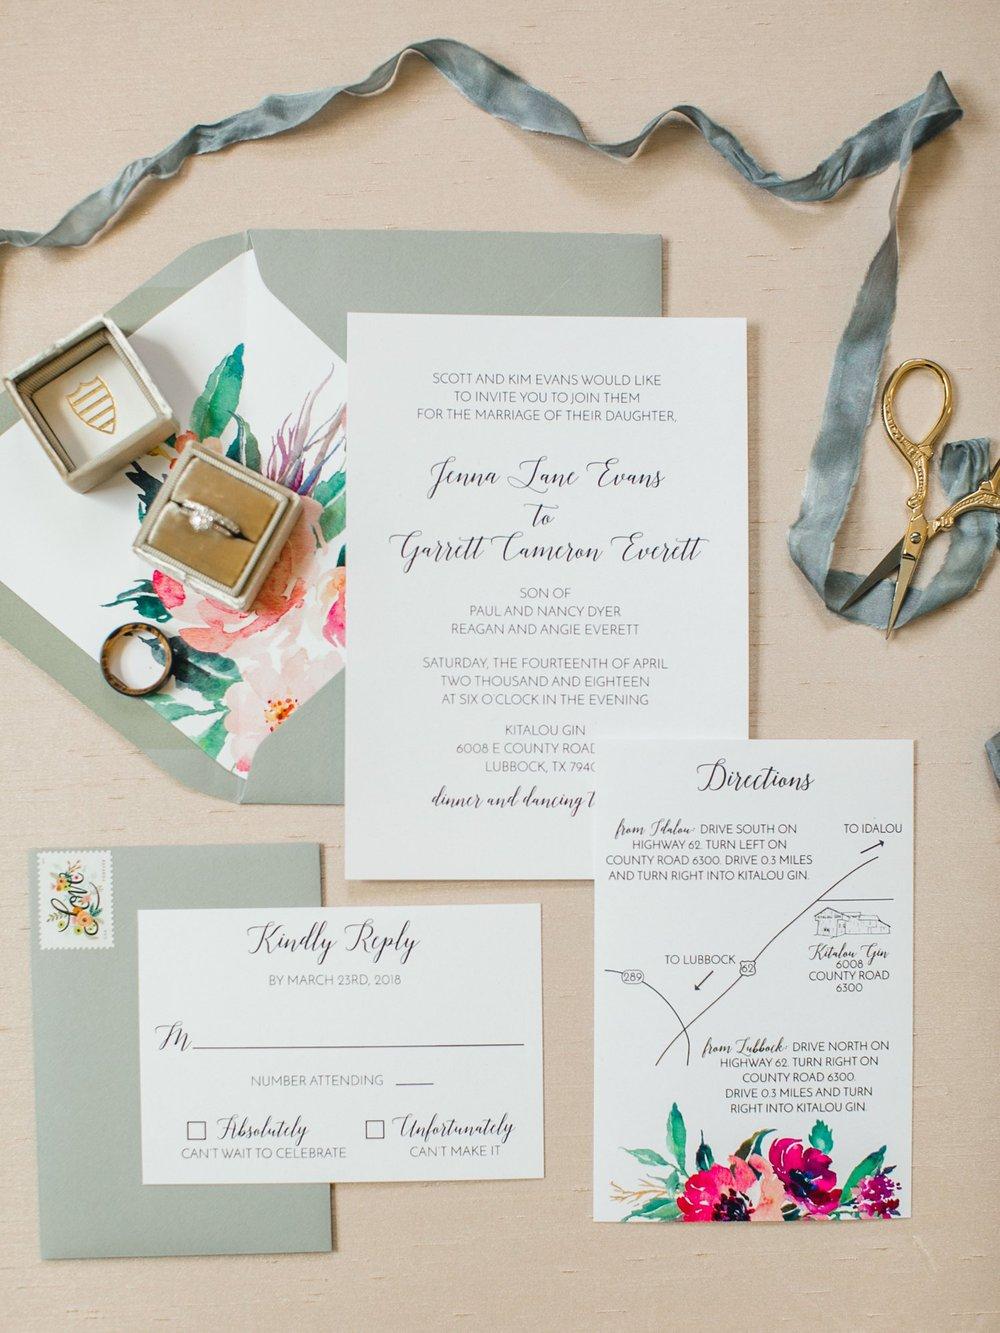 Jenna-and-garrett-Everett-kitalou-gin-lubbock-wedding-dayspring-designs-lubbock-wedding-photographer_0006.jpg